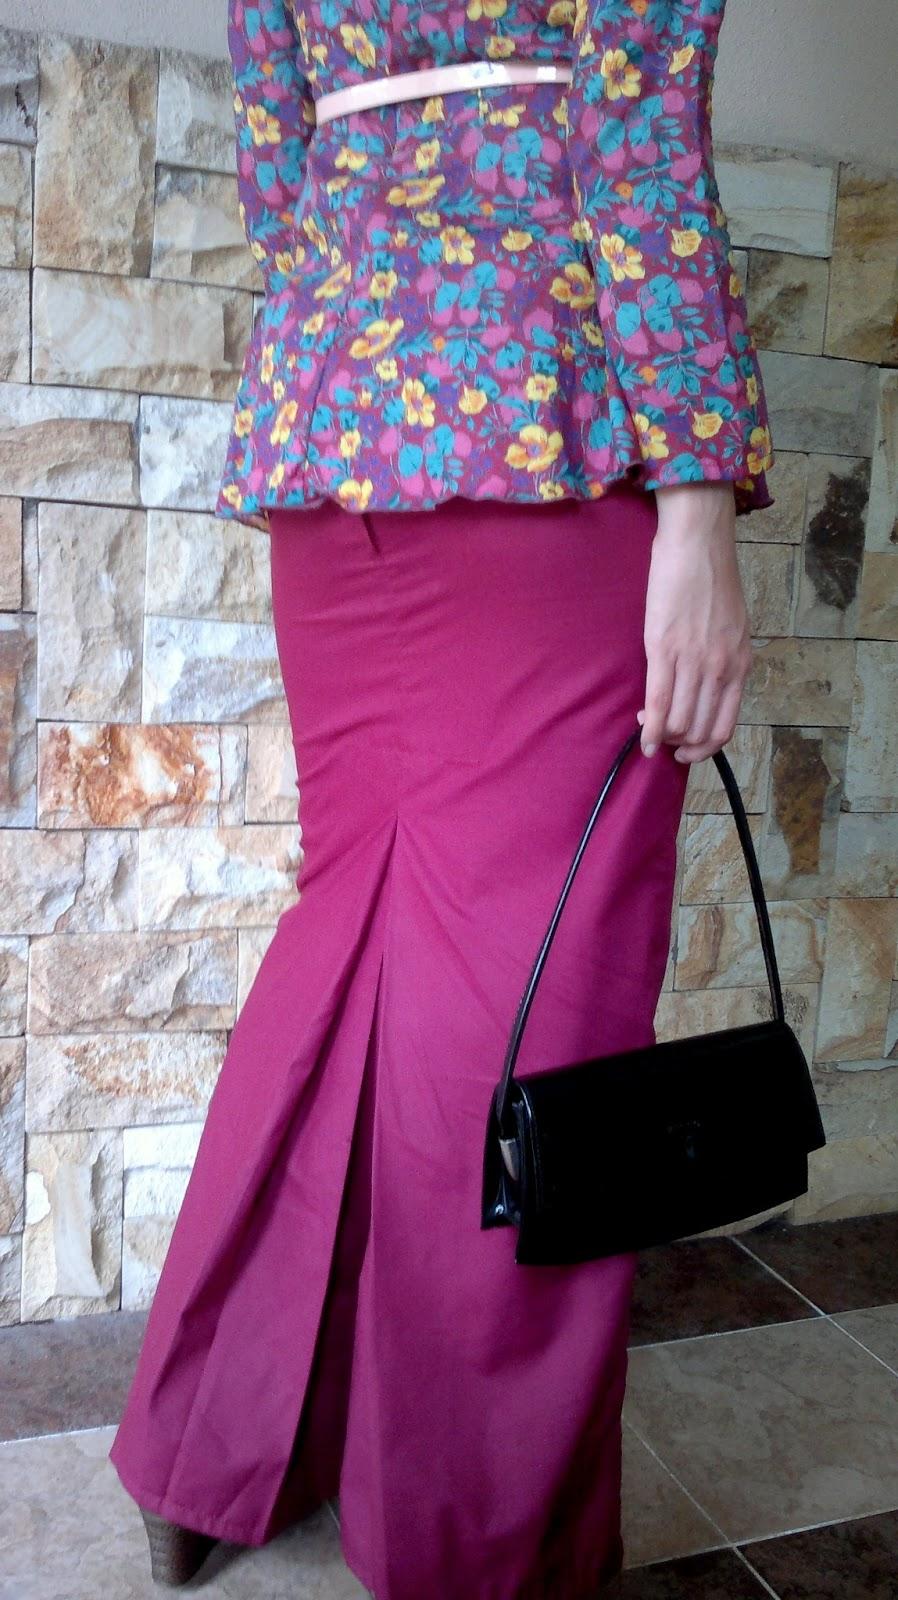 kain kipas belakang. me likey !